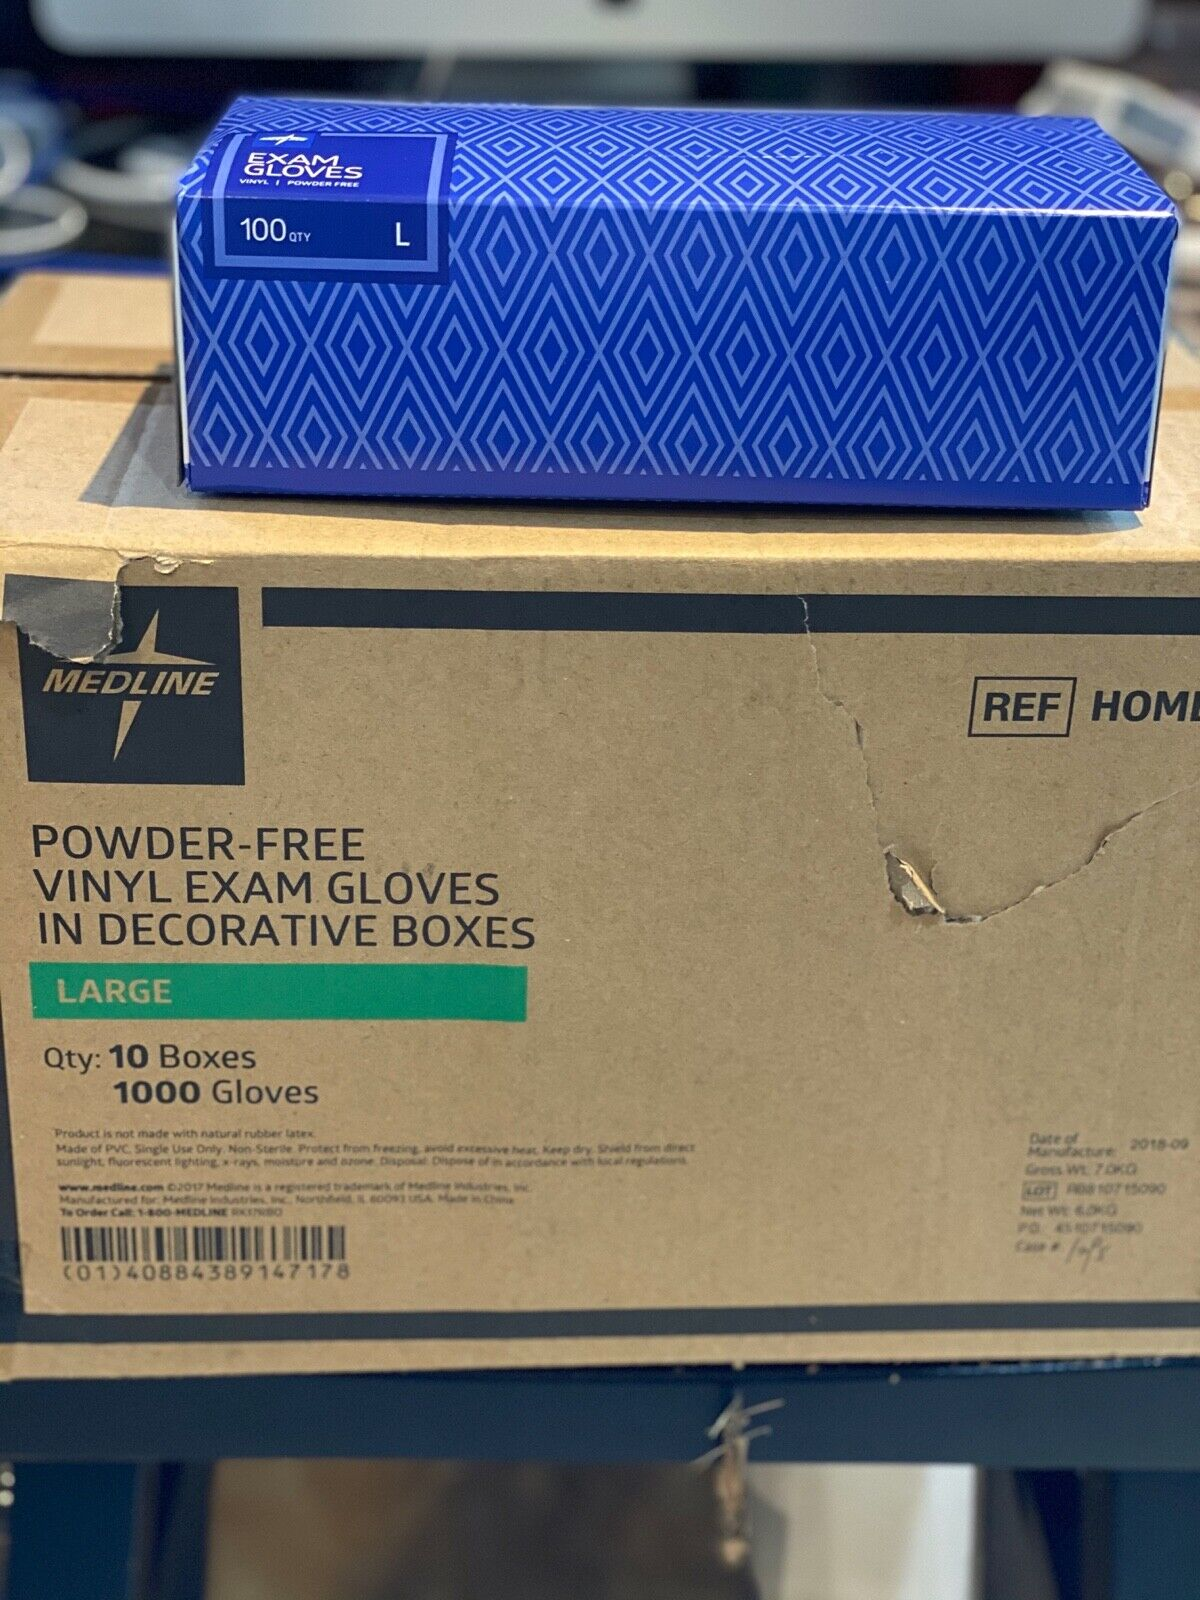 1 Box 100 Medline Large Vinyl Exam Gloves Powder-Free Large